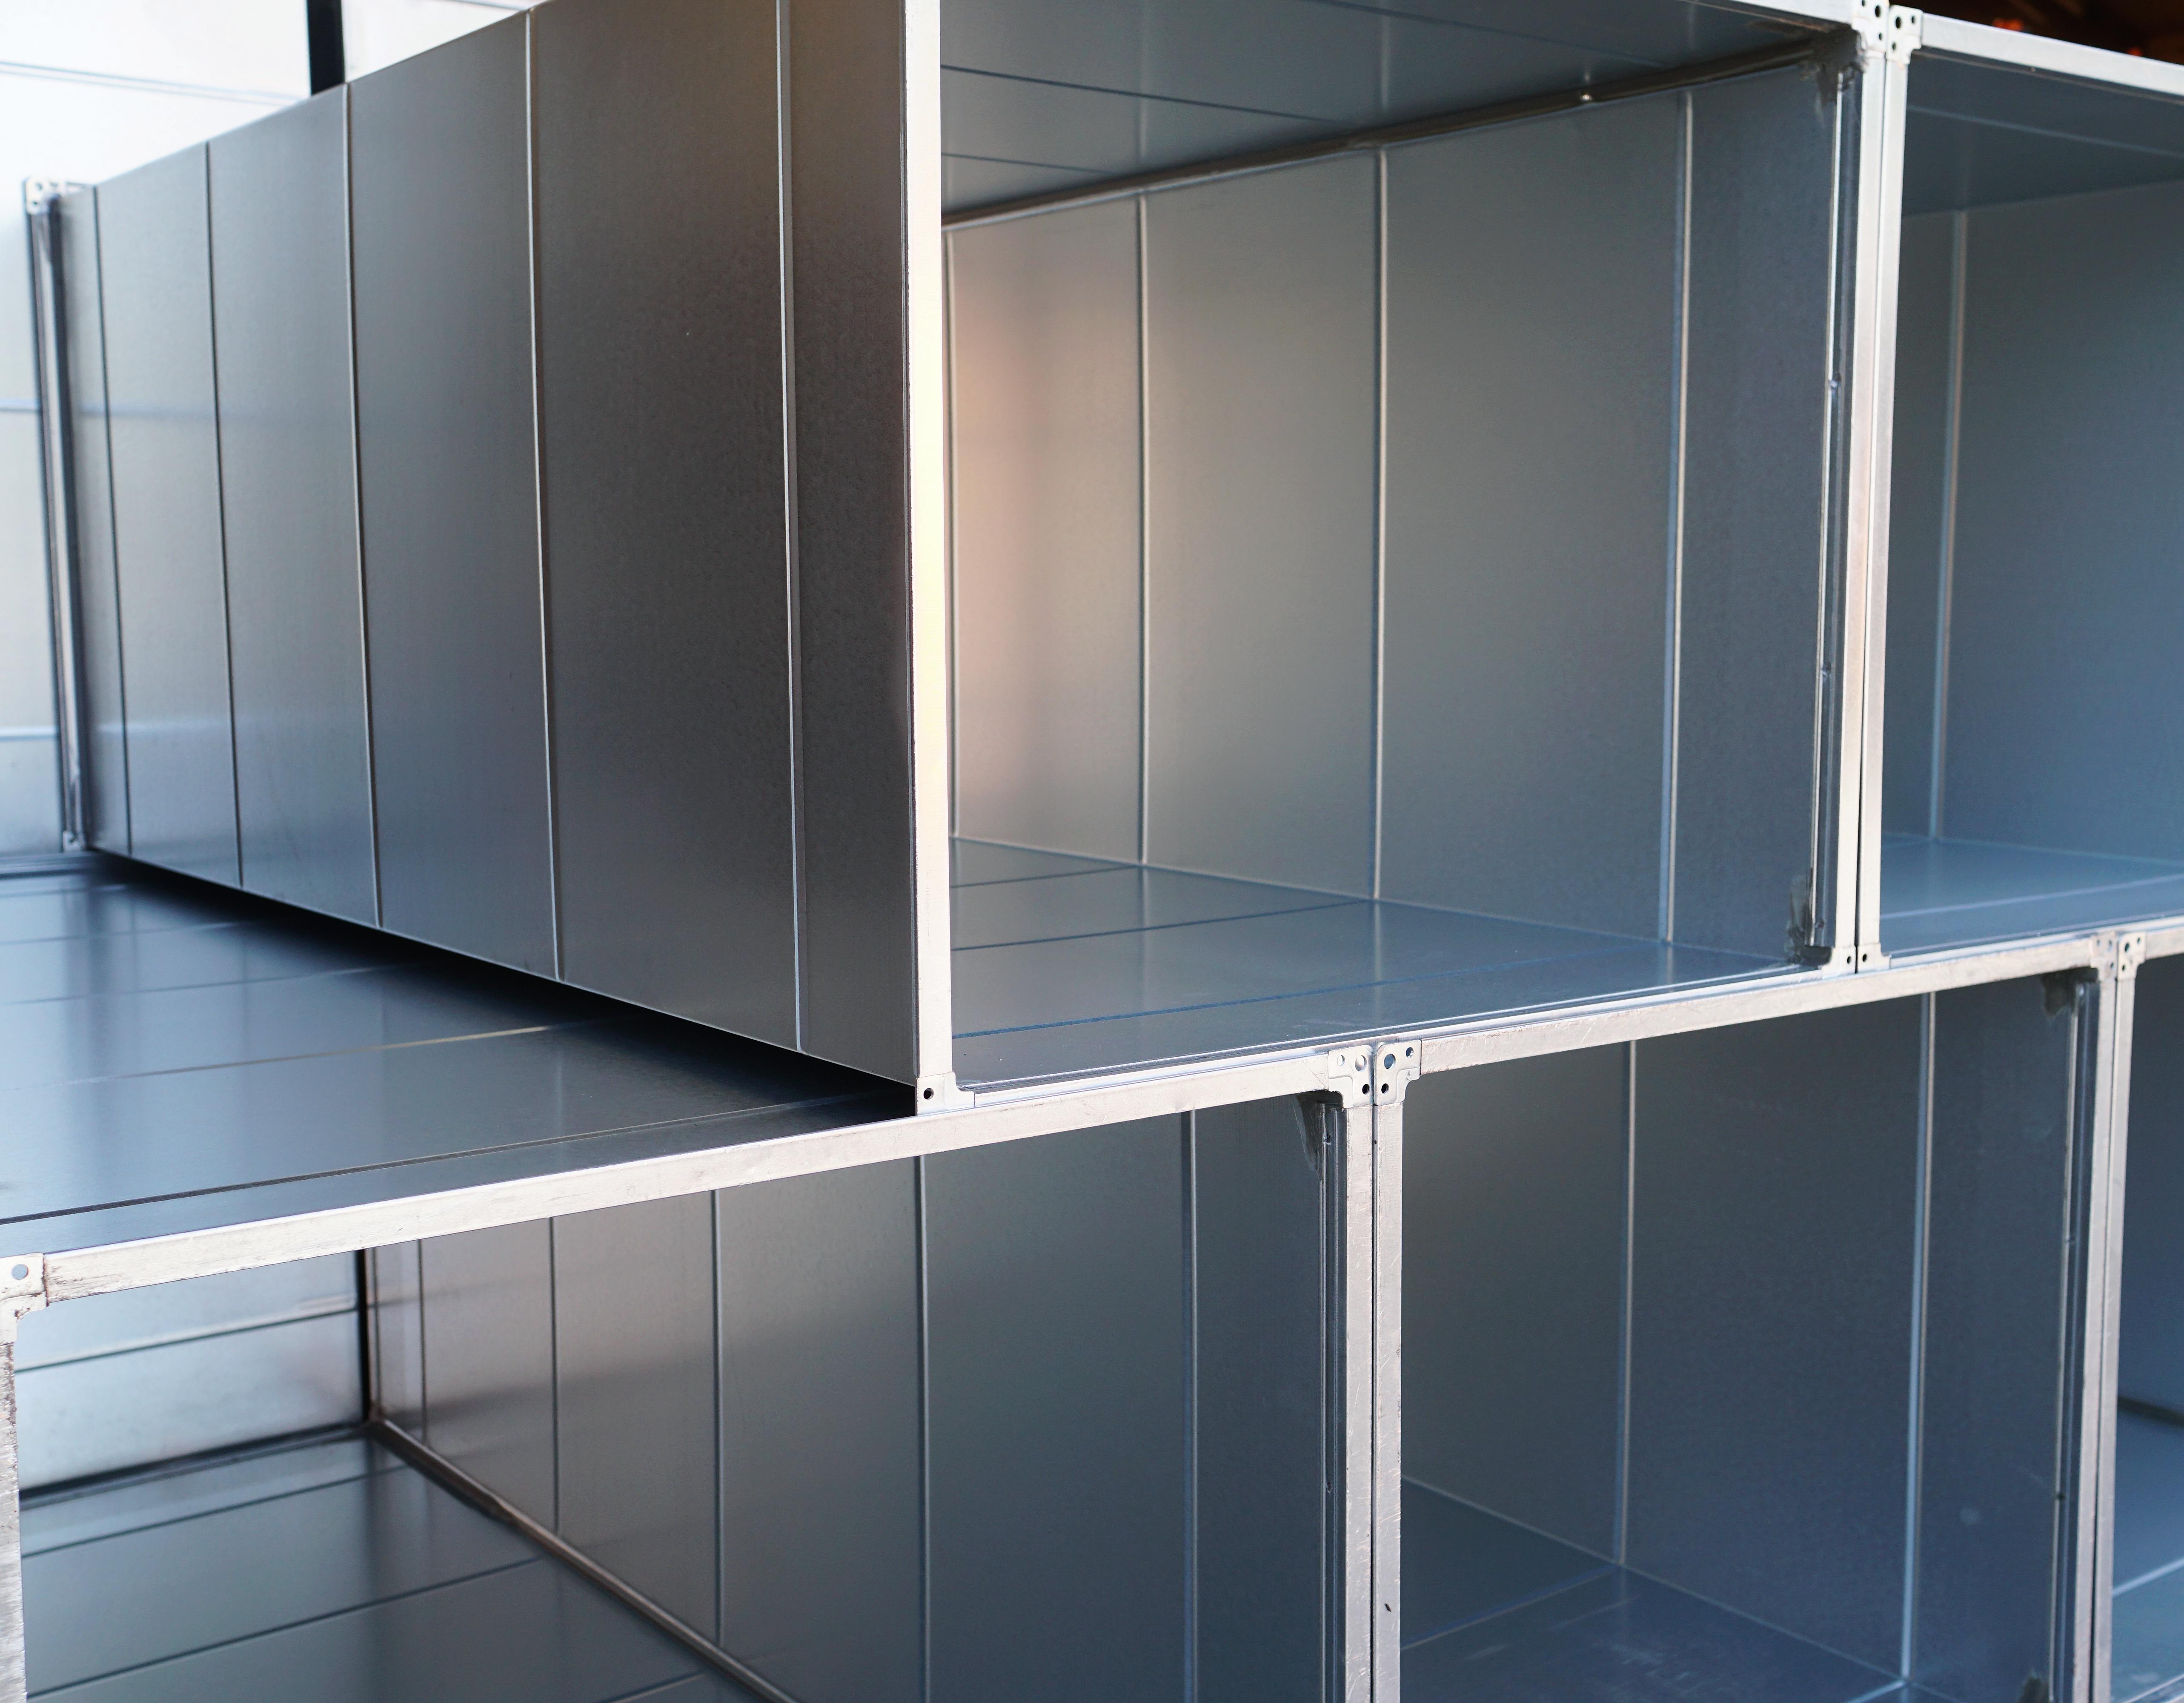 Bespoke rectangular ductwork